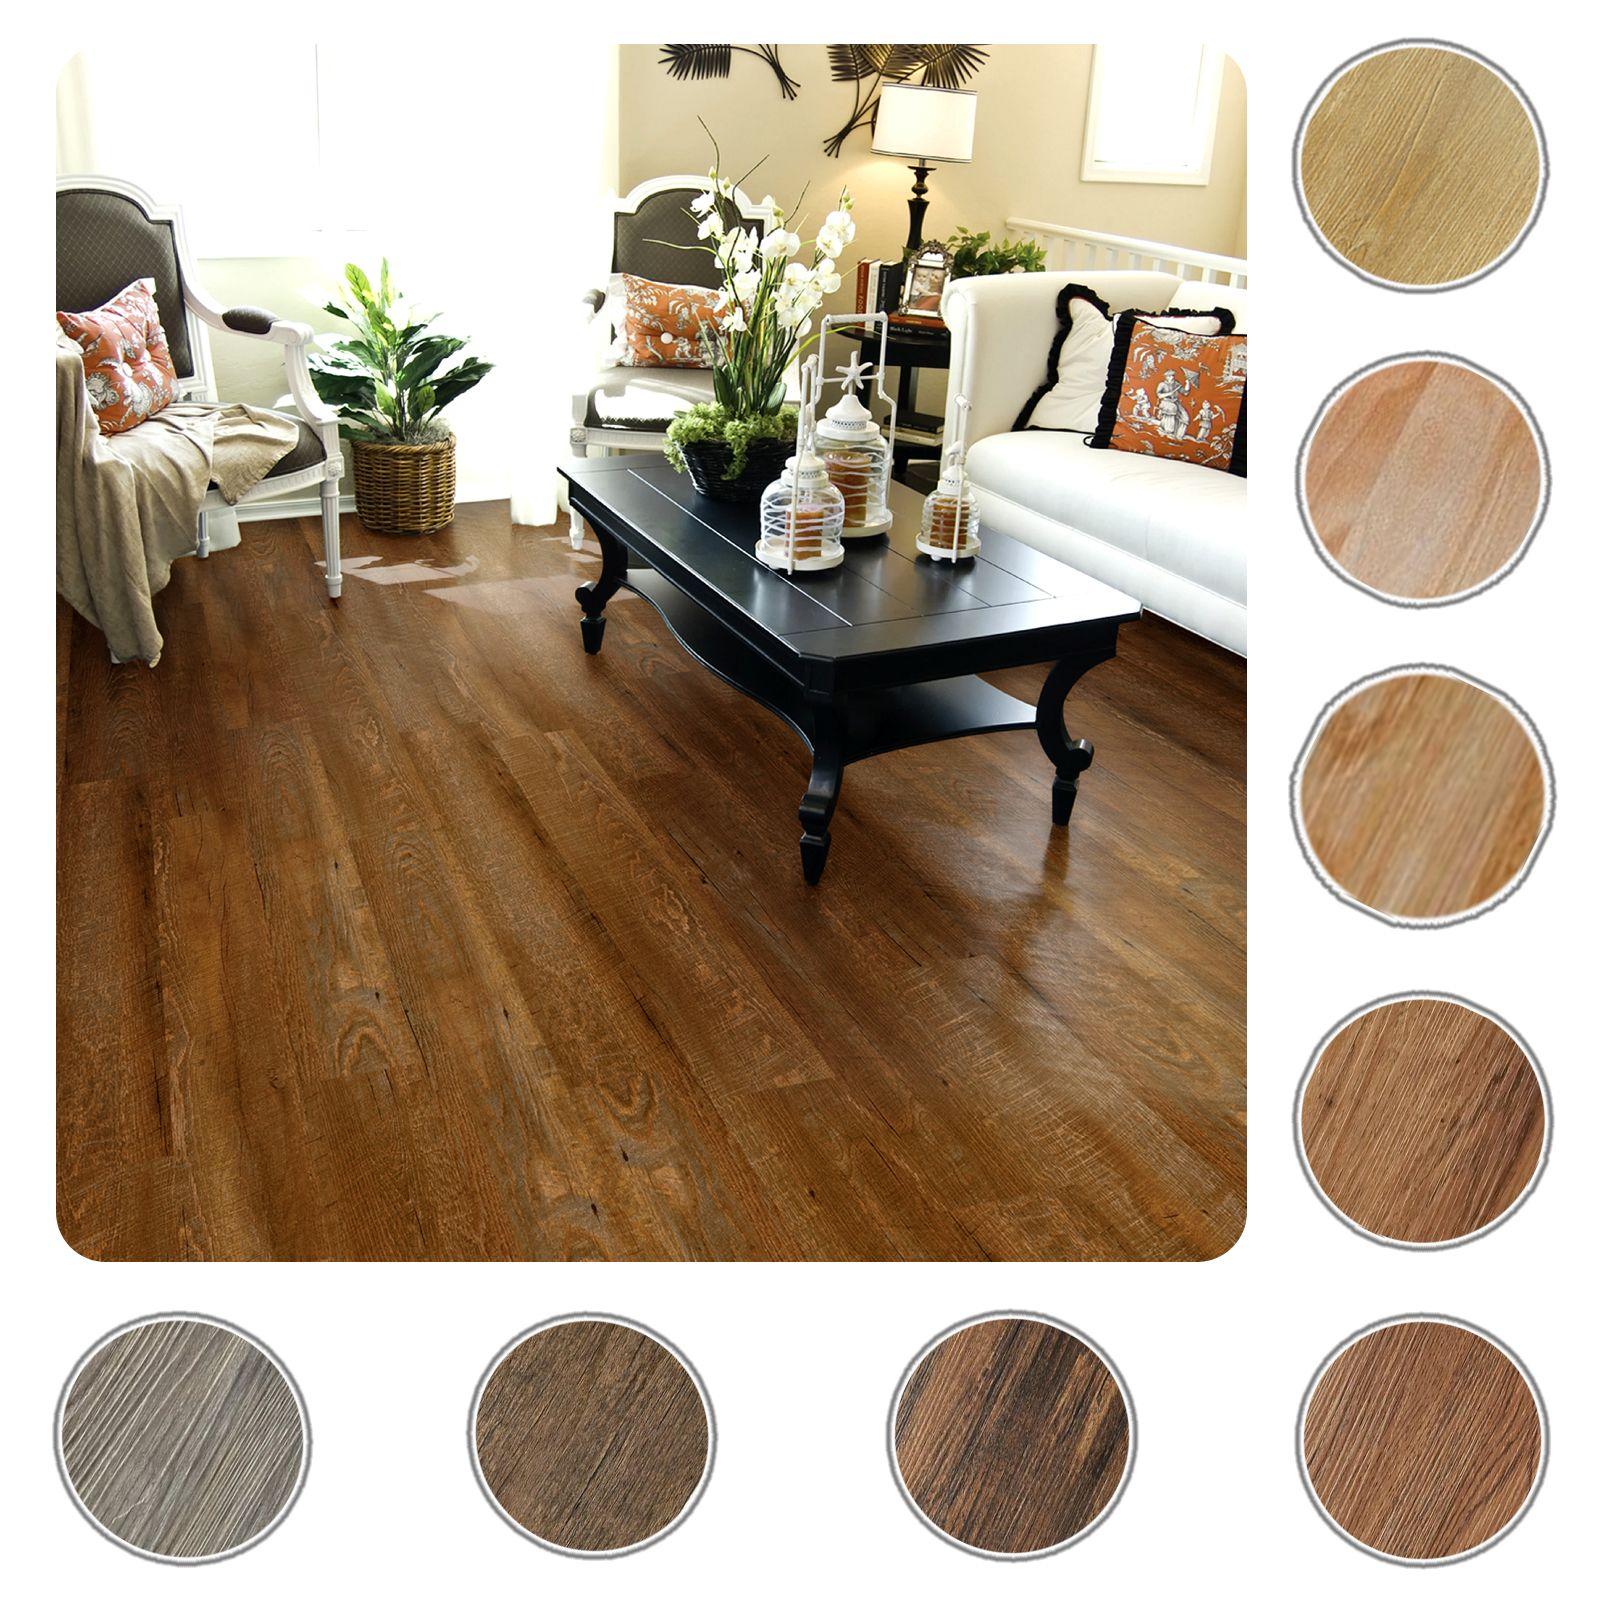 10 pack self adhesive vinyl hardwood wood peel n stick floor planks with images vinyl plank on kitchen remodel vinyl flooring id=99965